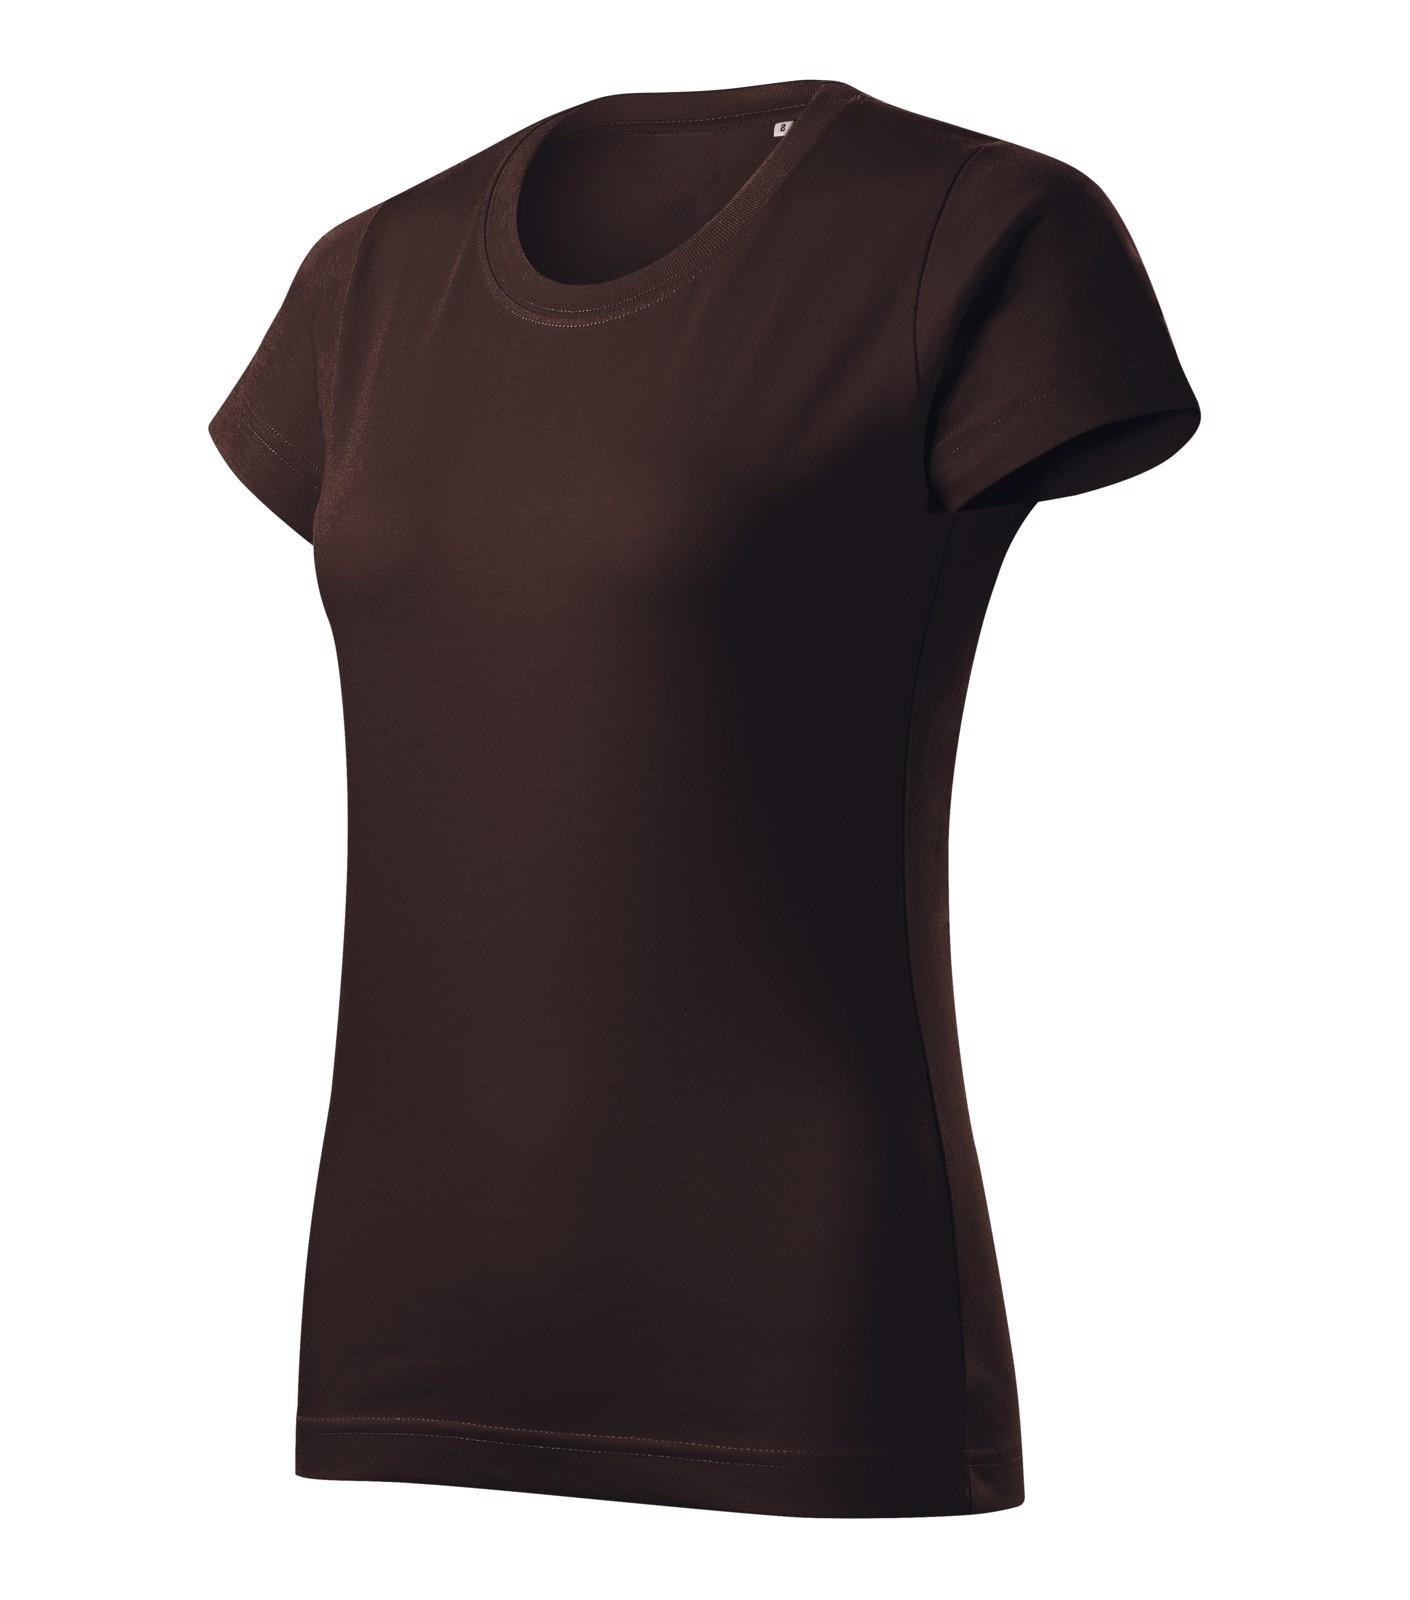 T-shirt women's Malfini Basic Free - Coffee / 2XL